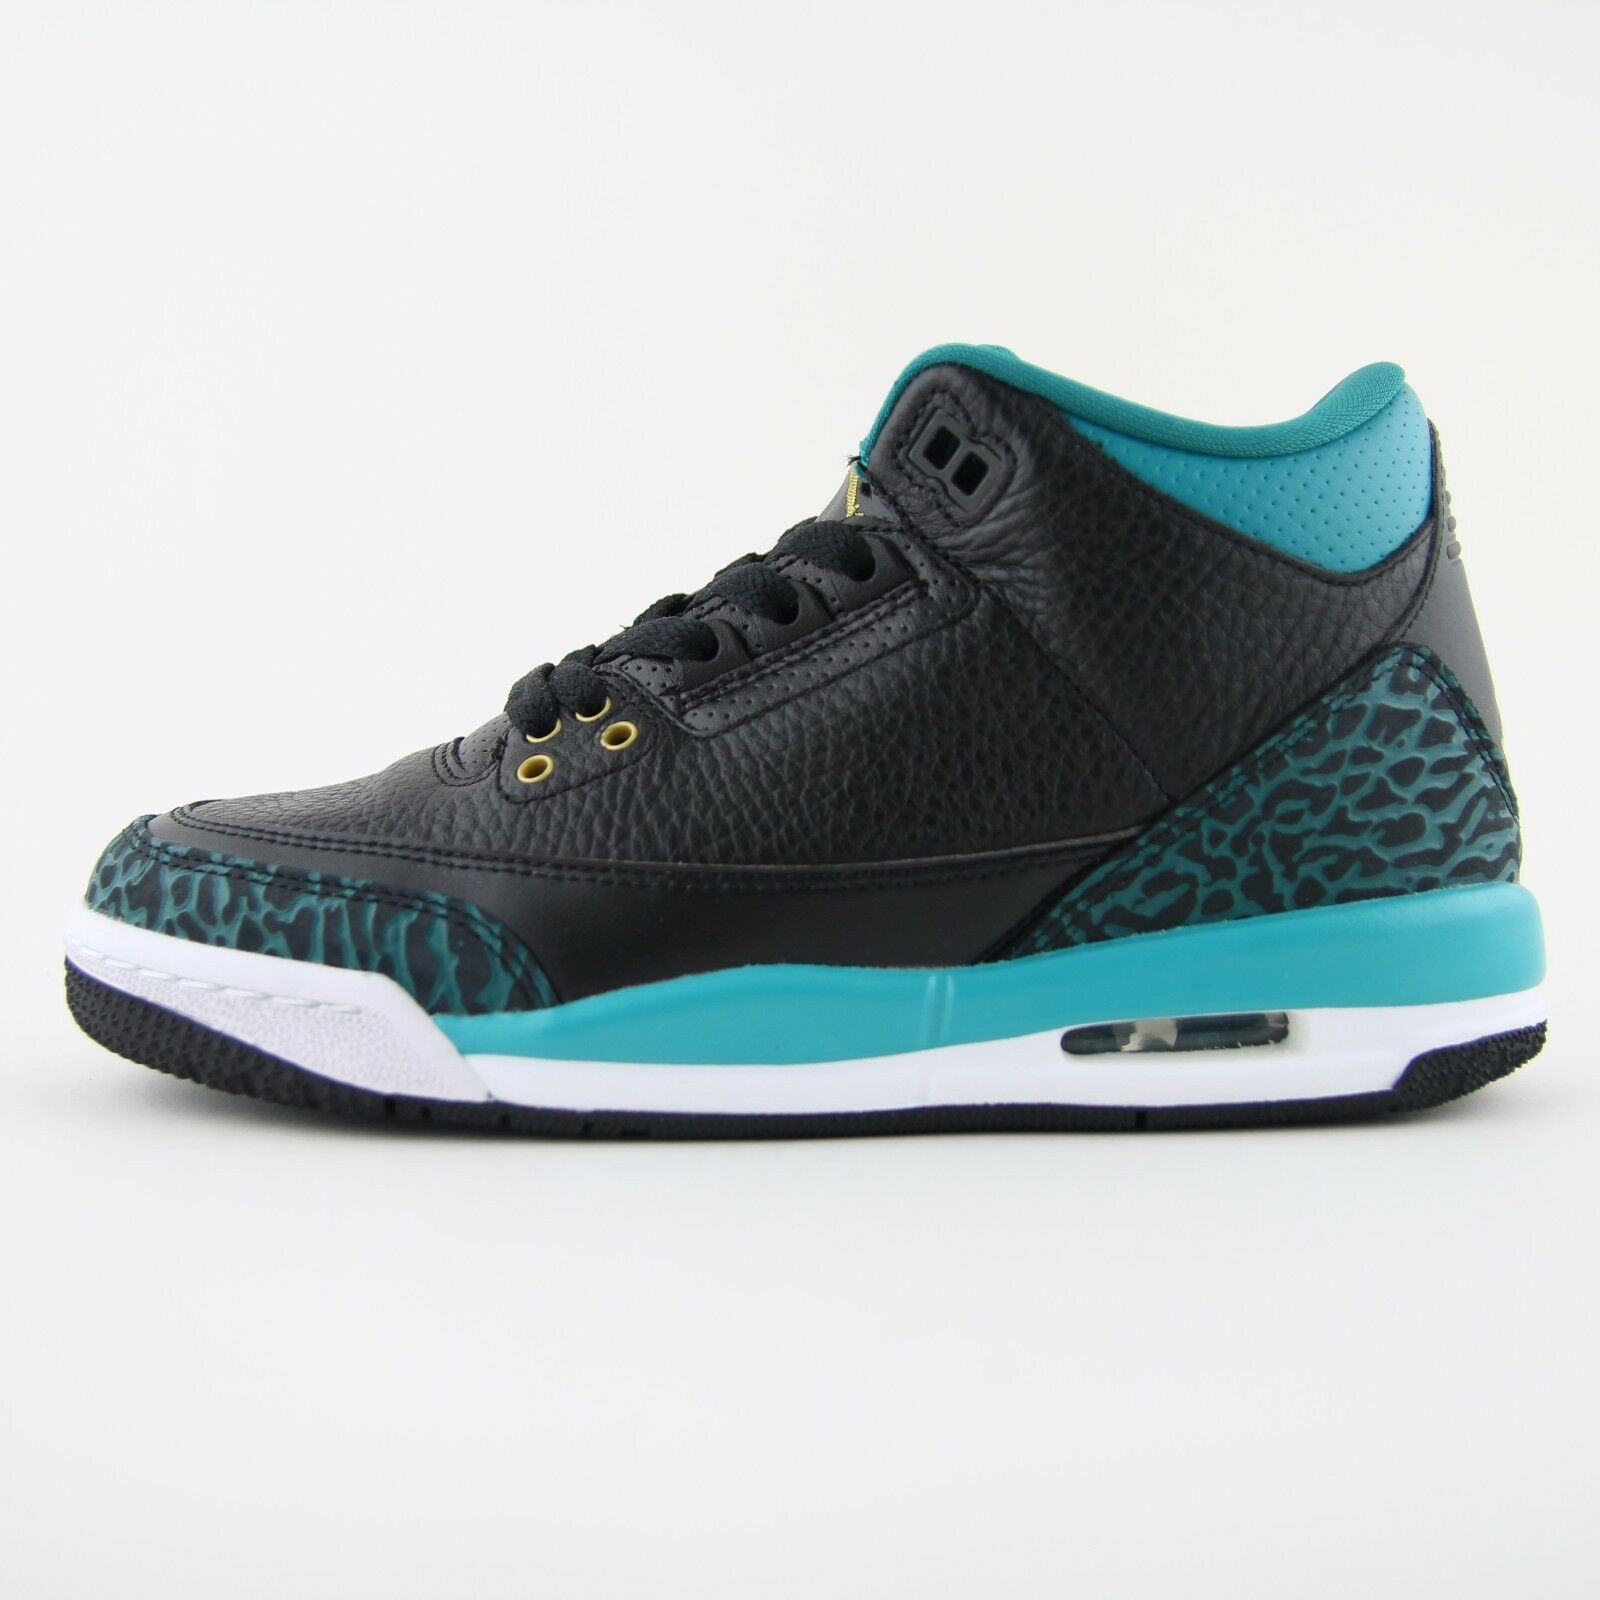 New Womens Nike Air Jordan 3 III Retro Black Trainers Sneakers